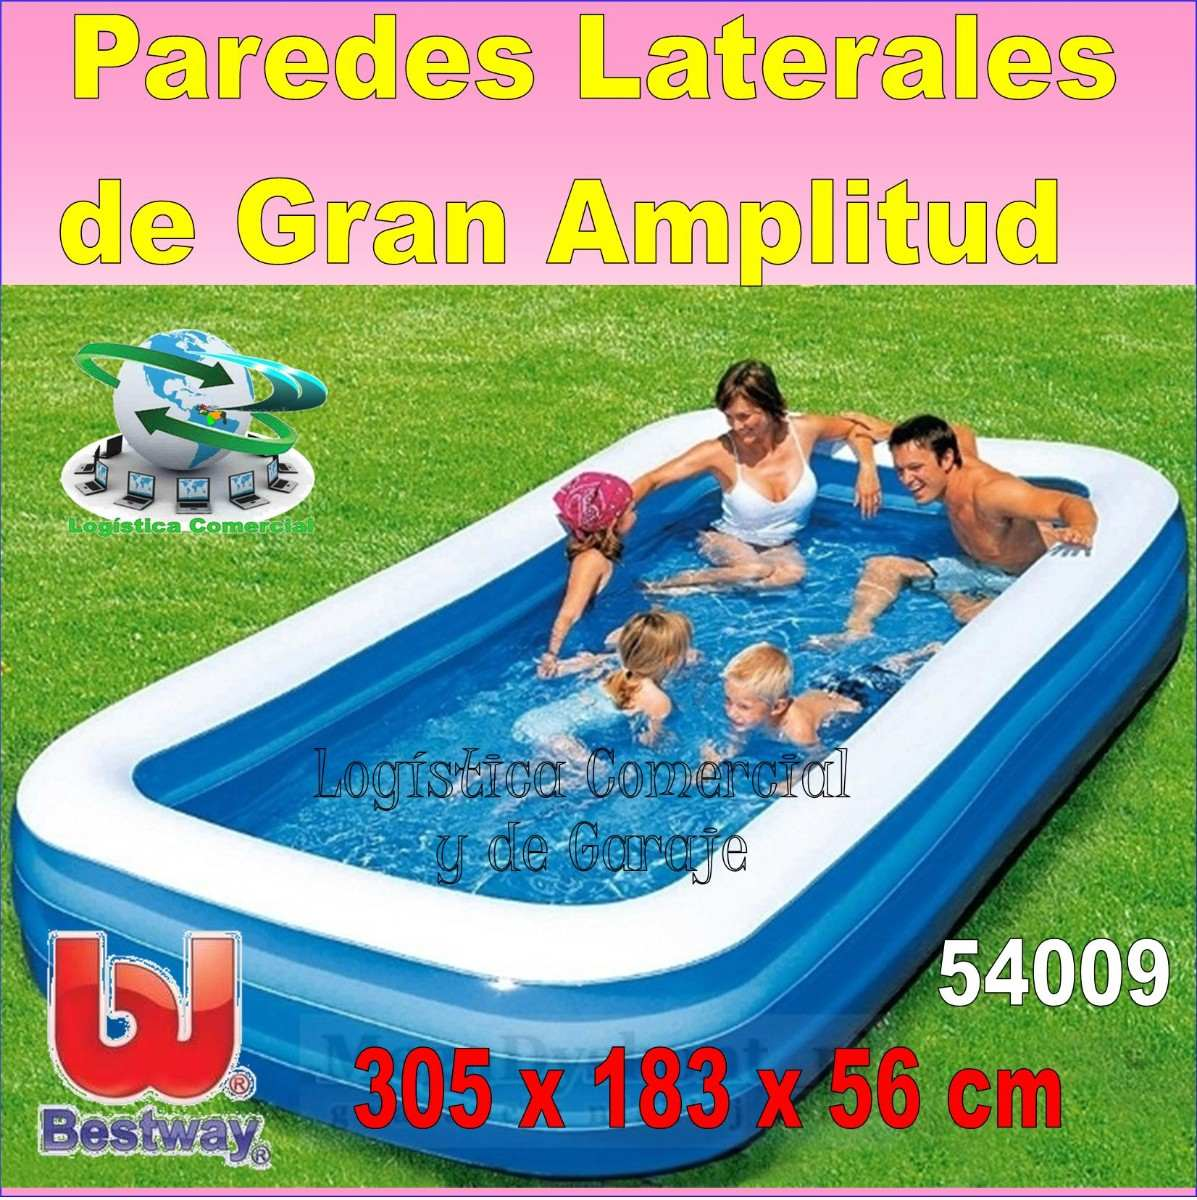 Piscina familiar rectangular 3anillos bestway 305x183x56cm bs en mercado libre - Piscine in plastica ...